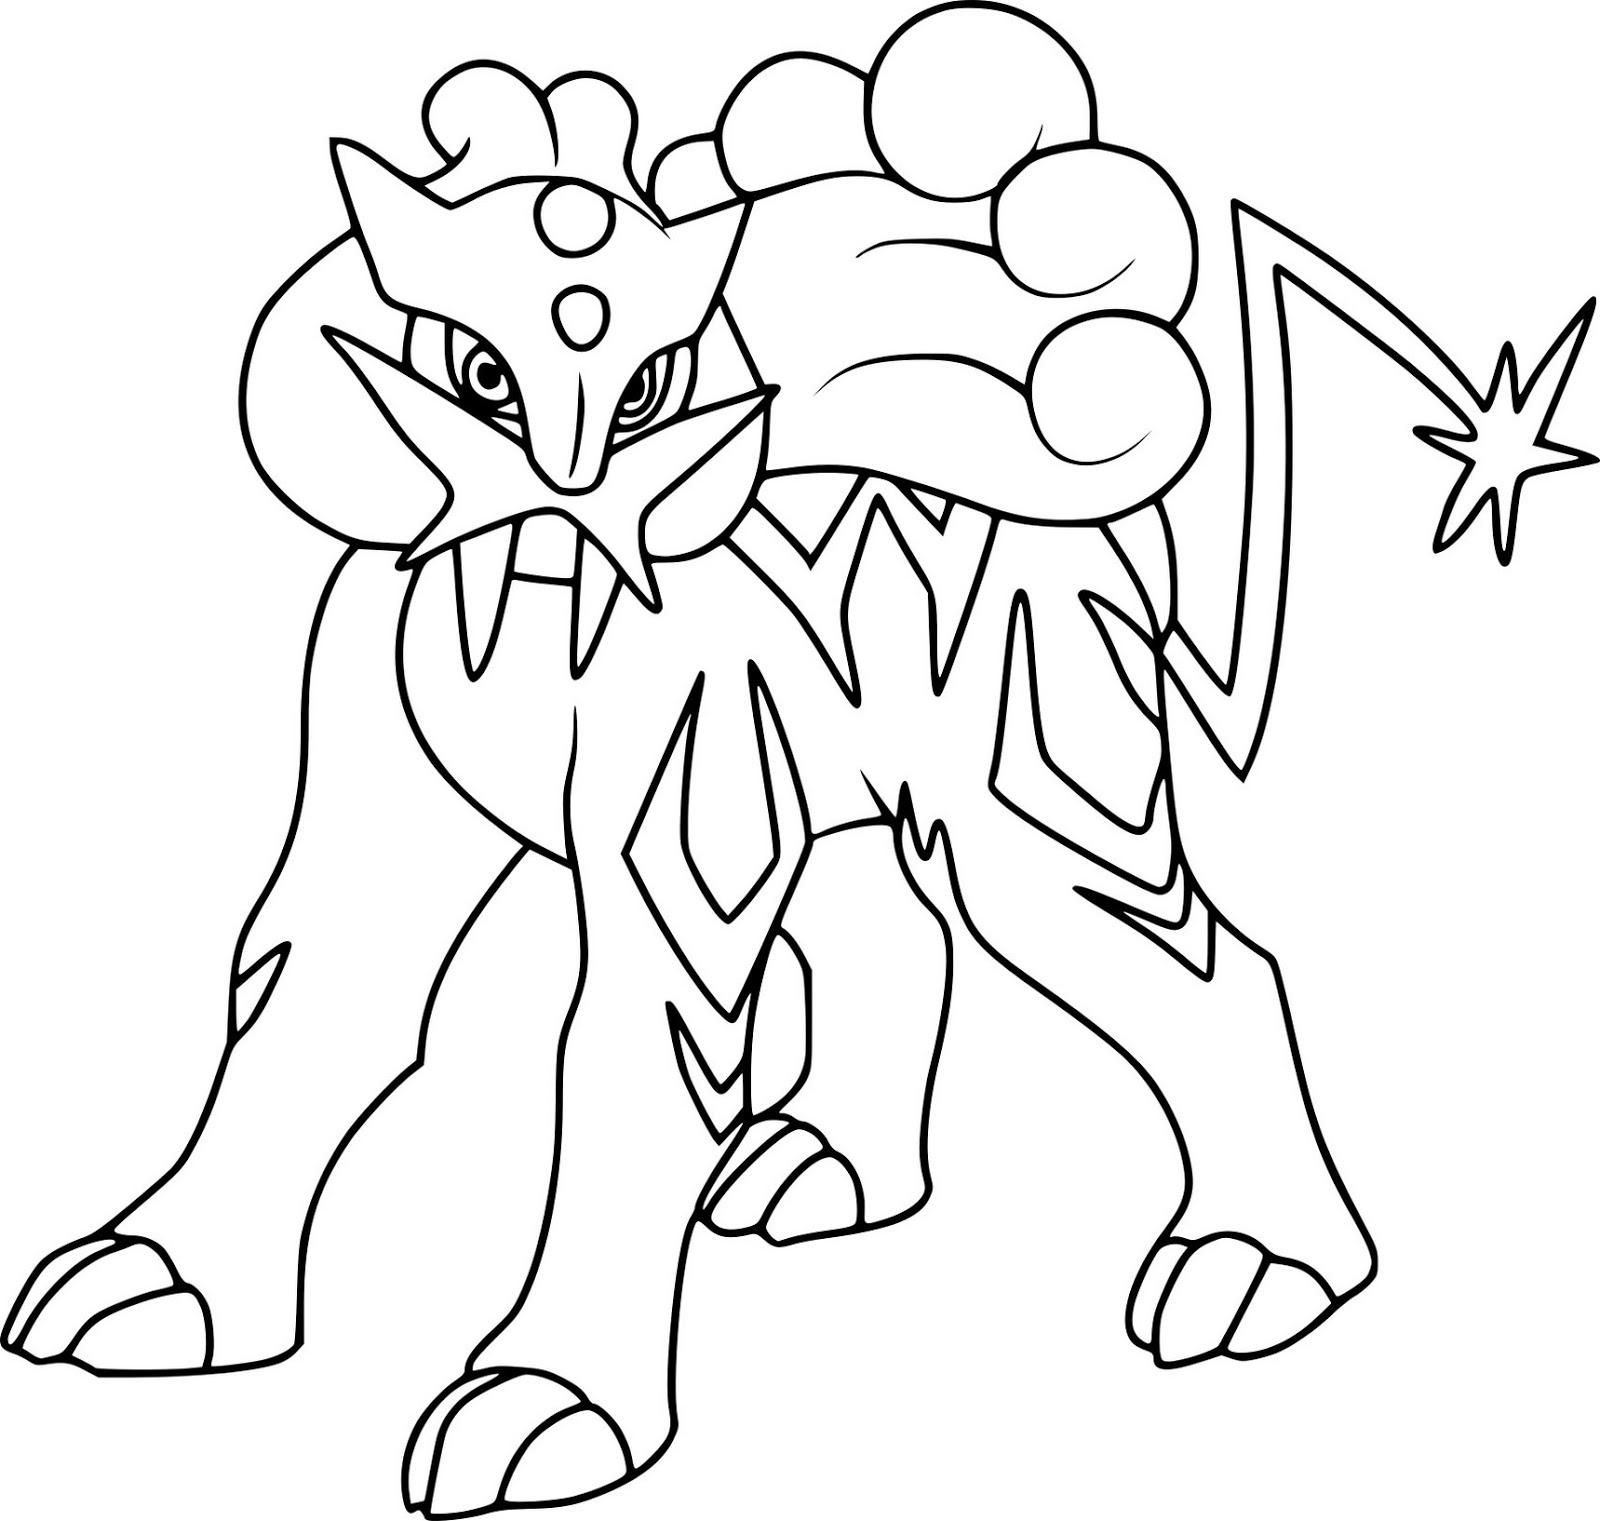 - Raikou Pokemon Coloring Pages - Free Pokemon Coloring Pages